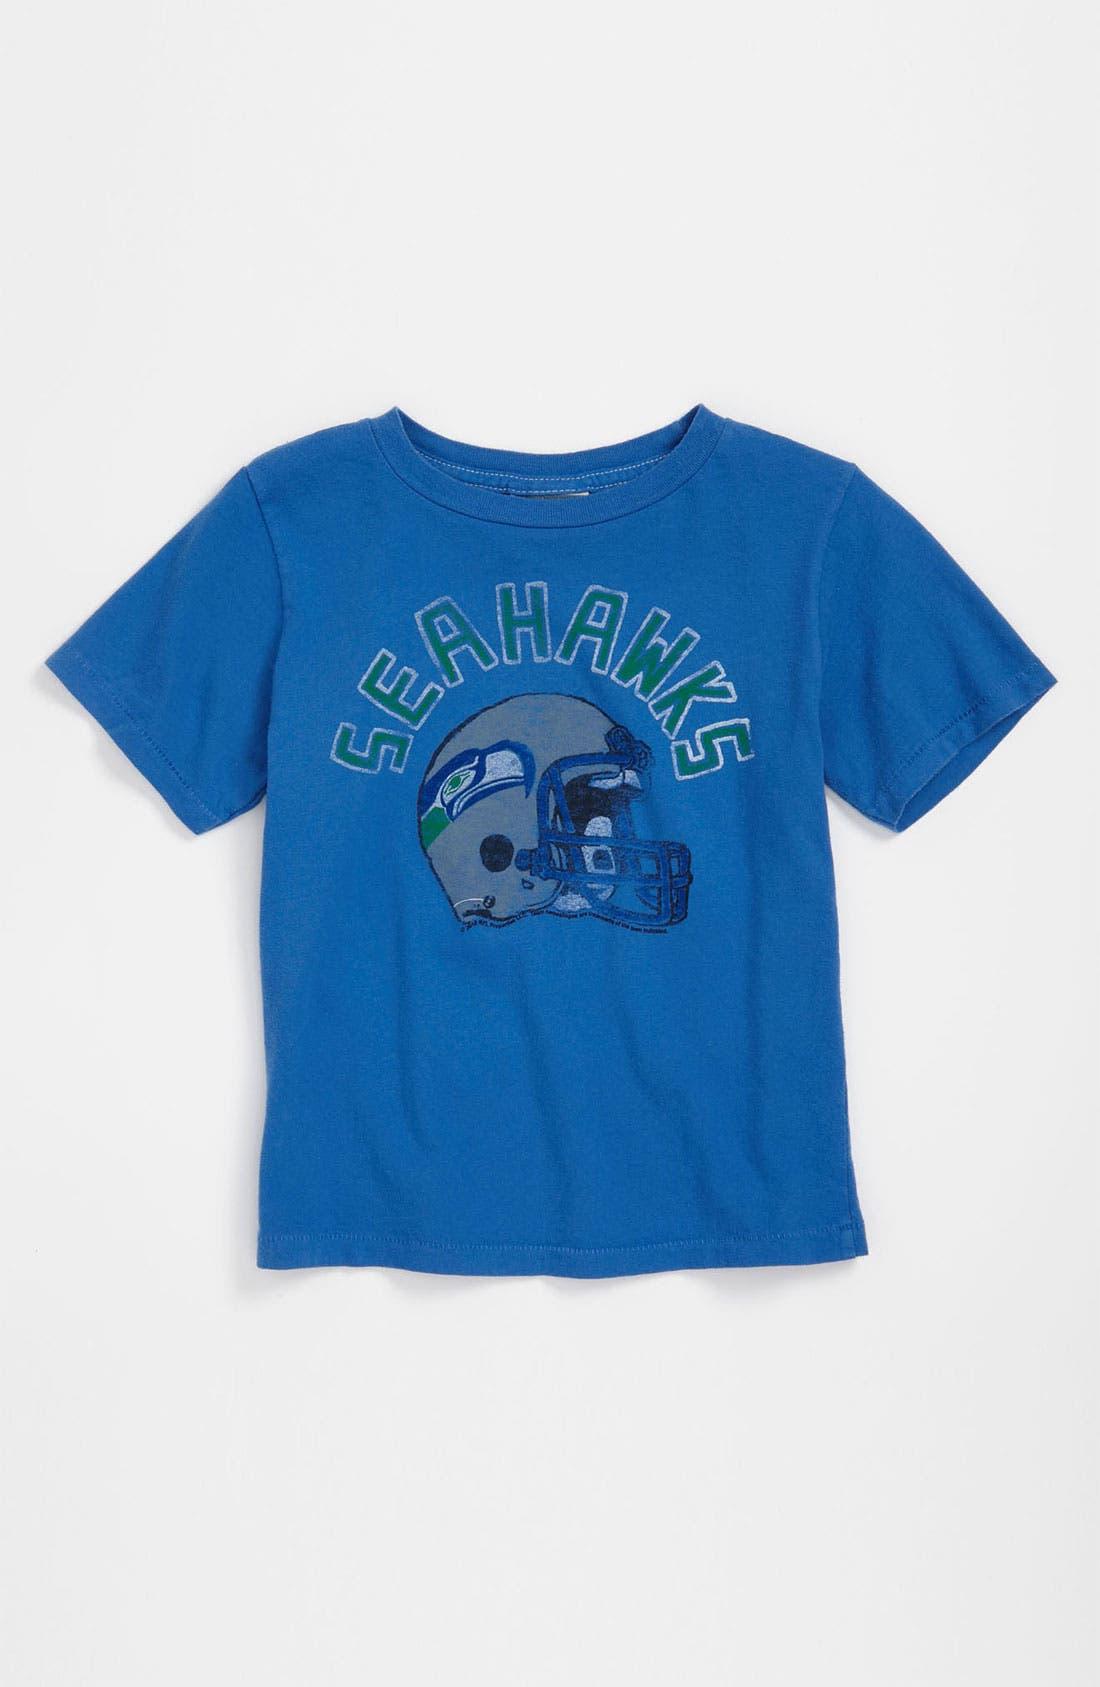 Alternate Image 1 Selected - Junk Food 'Seattle Seahawks' T-Shirt (Infant)